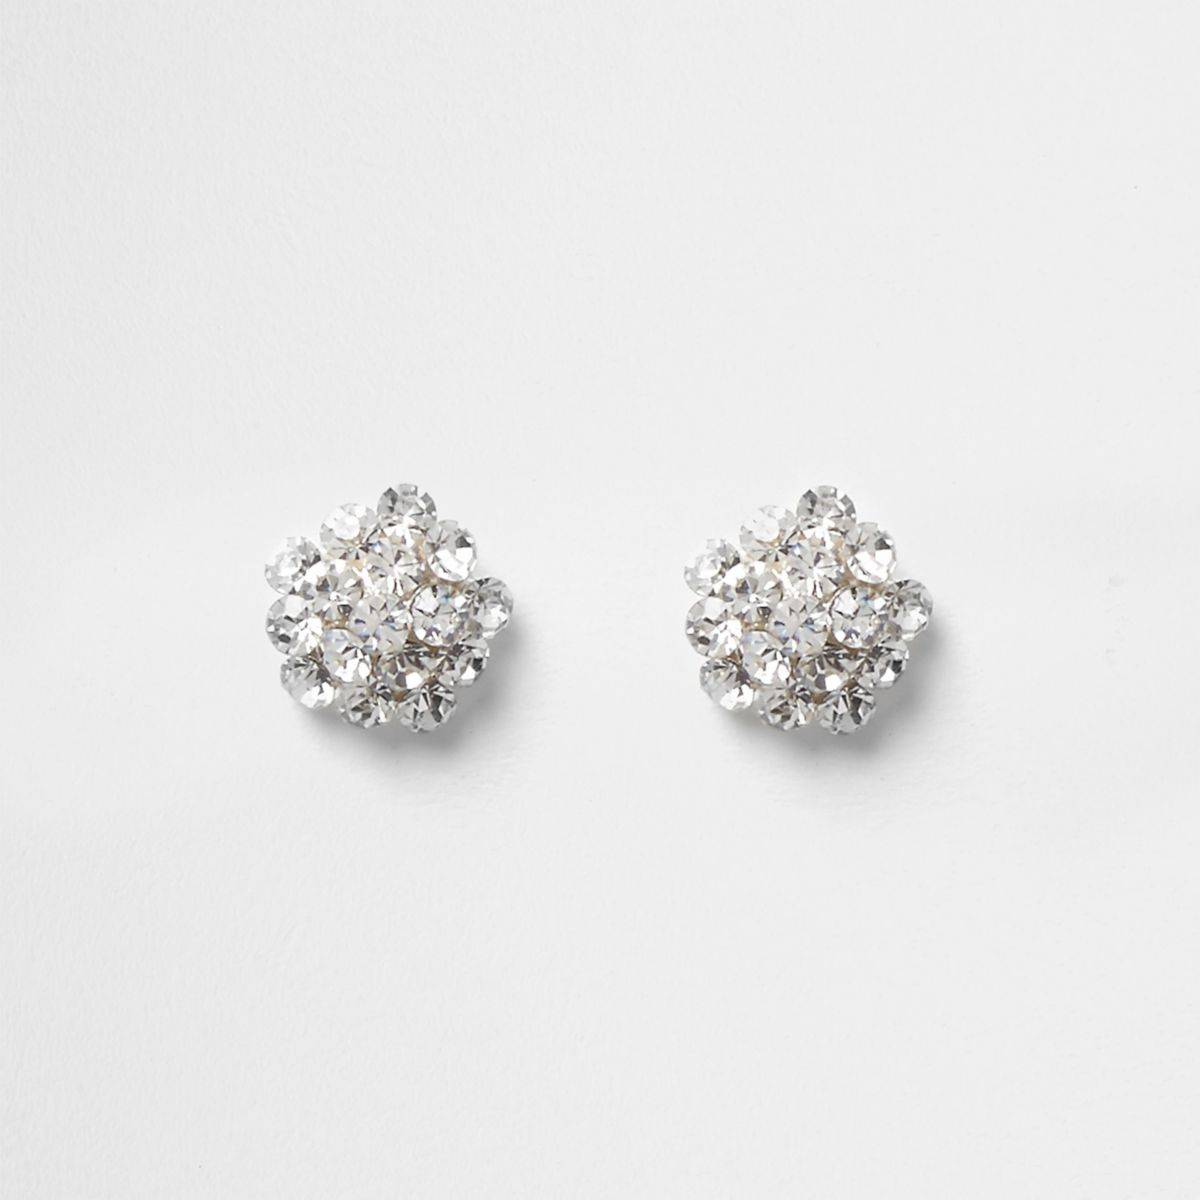 Silver tone diamante cluster stud earrings